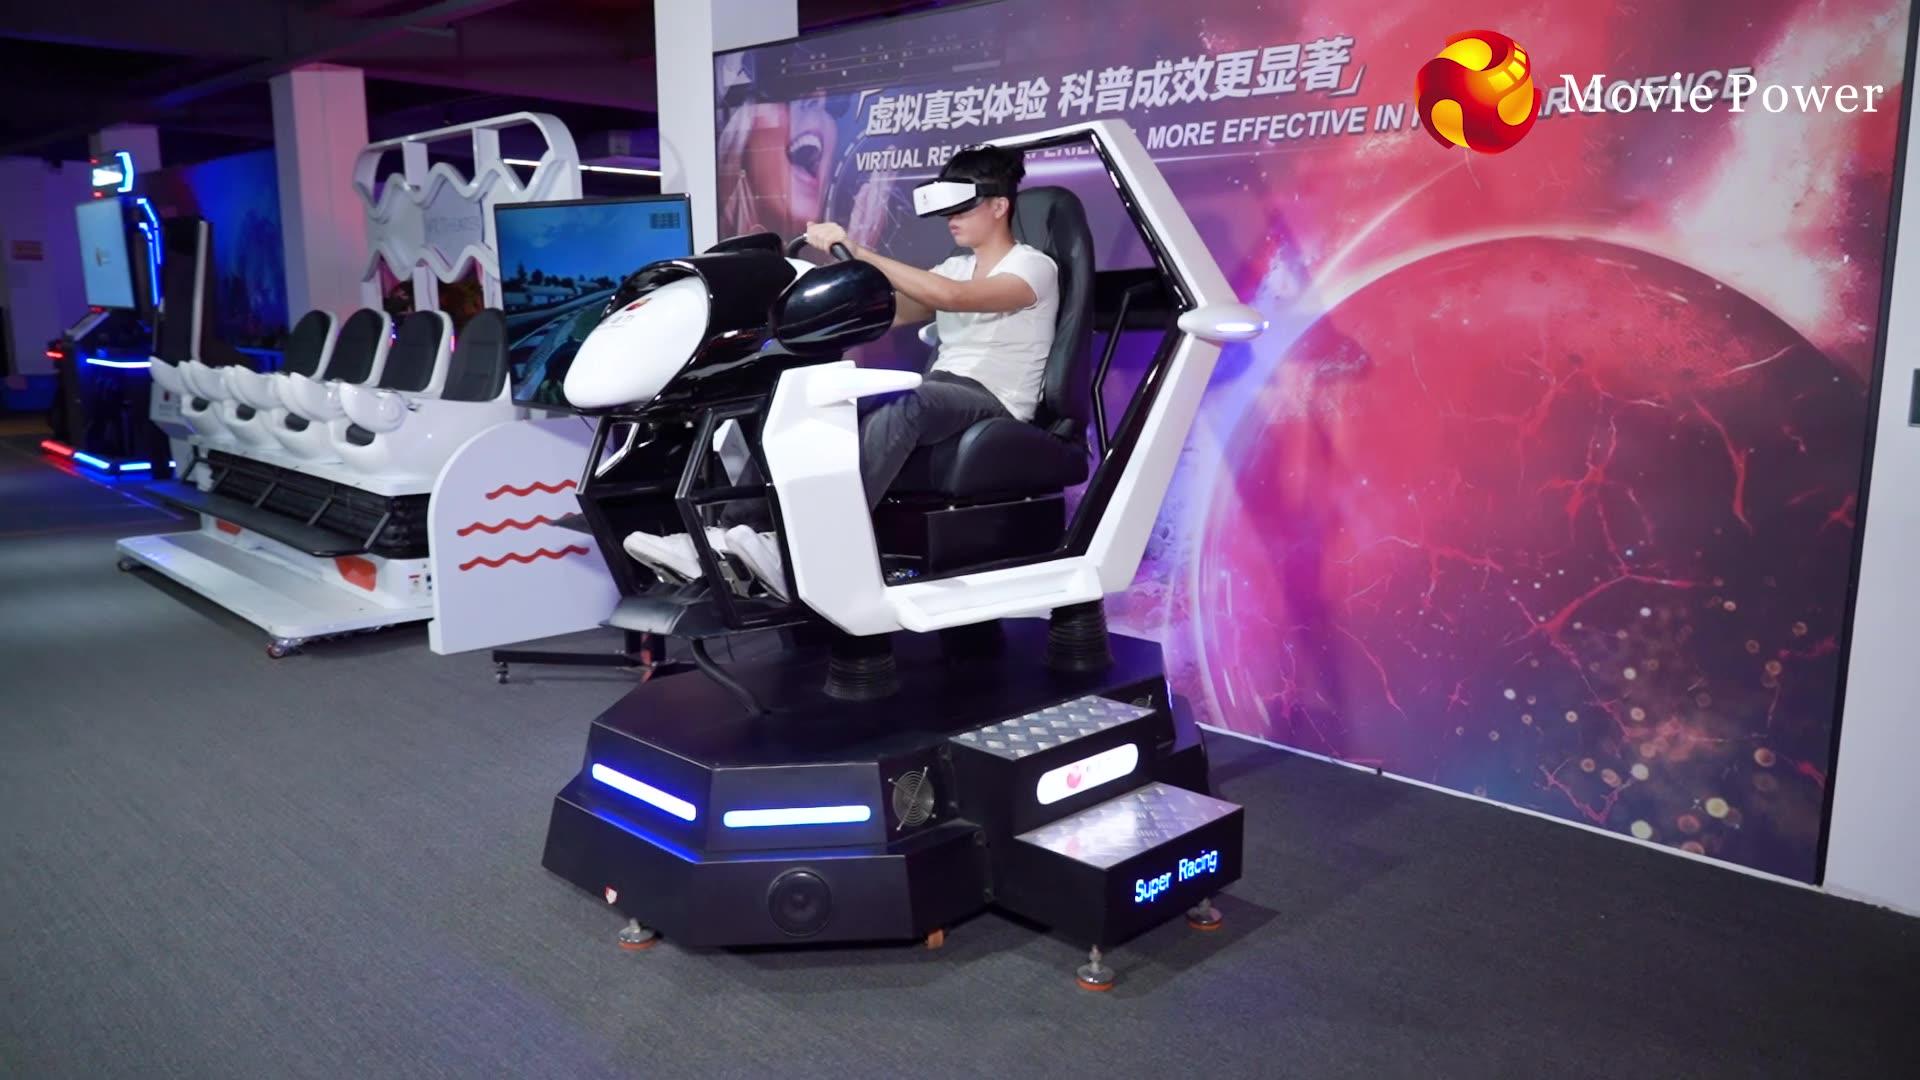 Movie Power Simulator Driving Car Super Racing Game Machine Arcade Games